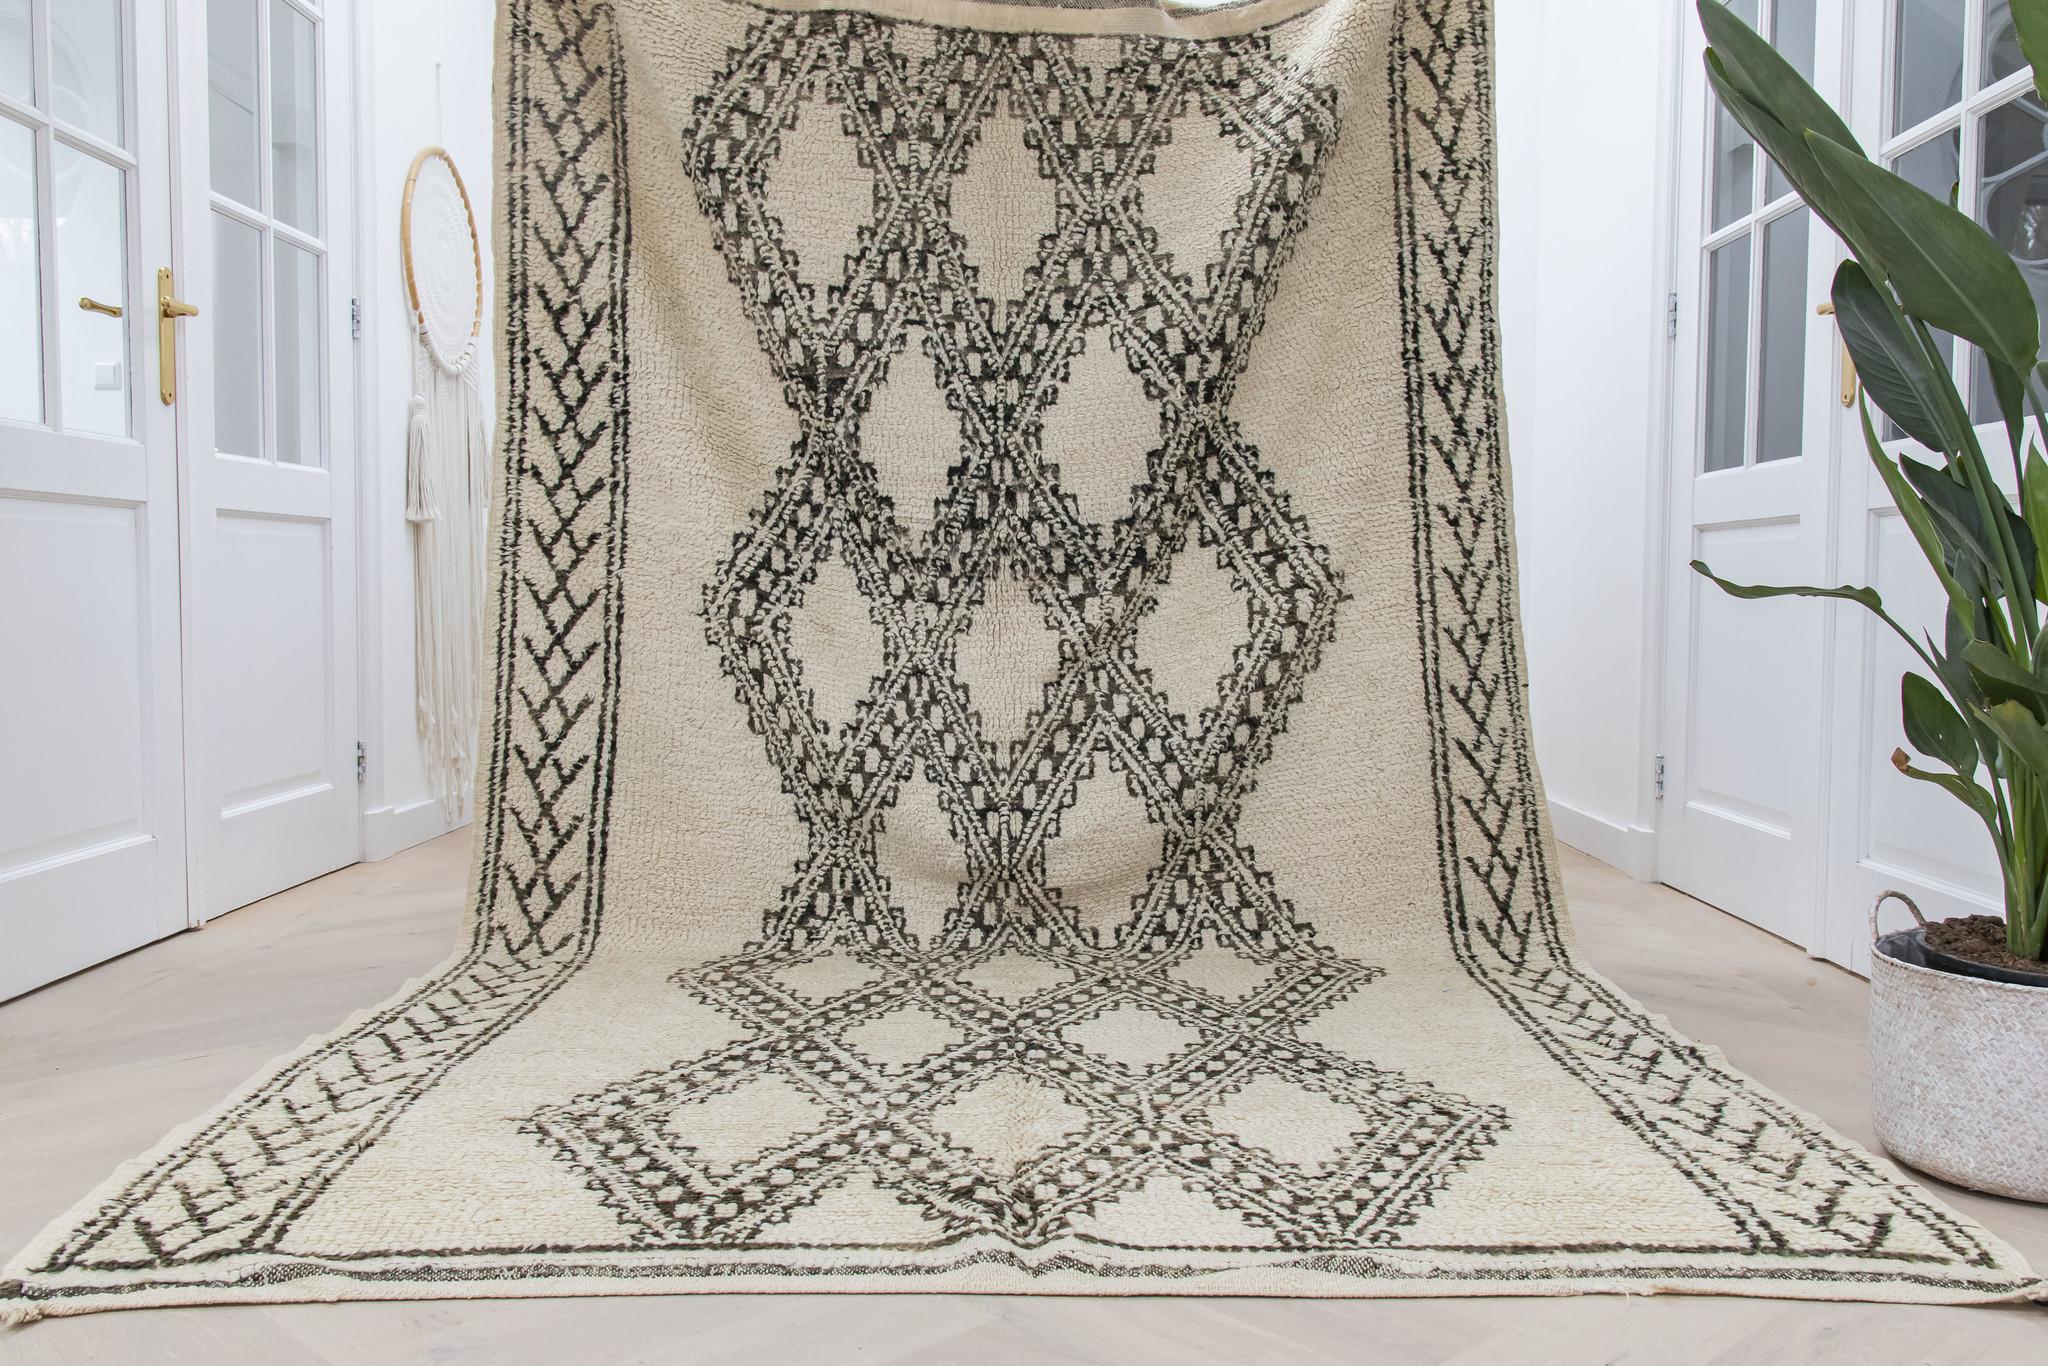 Simply Pure Handgemaakt vintage Marmoucha vloerkleed uit Marokko 182 x 317 cm